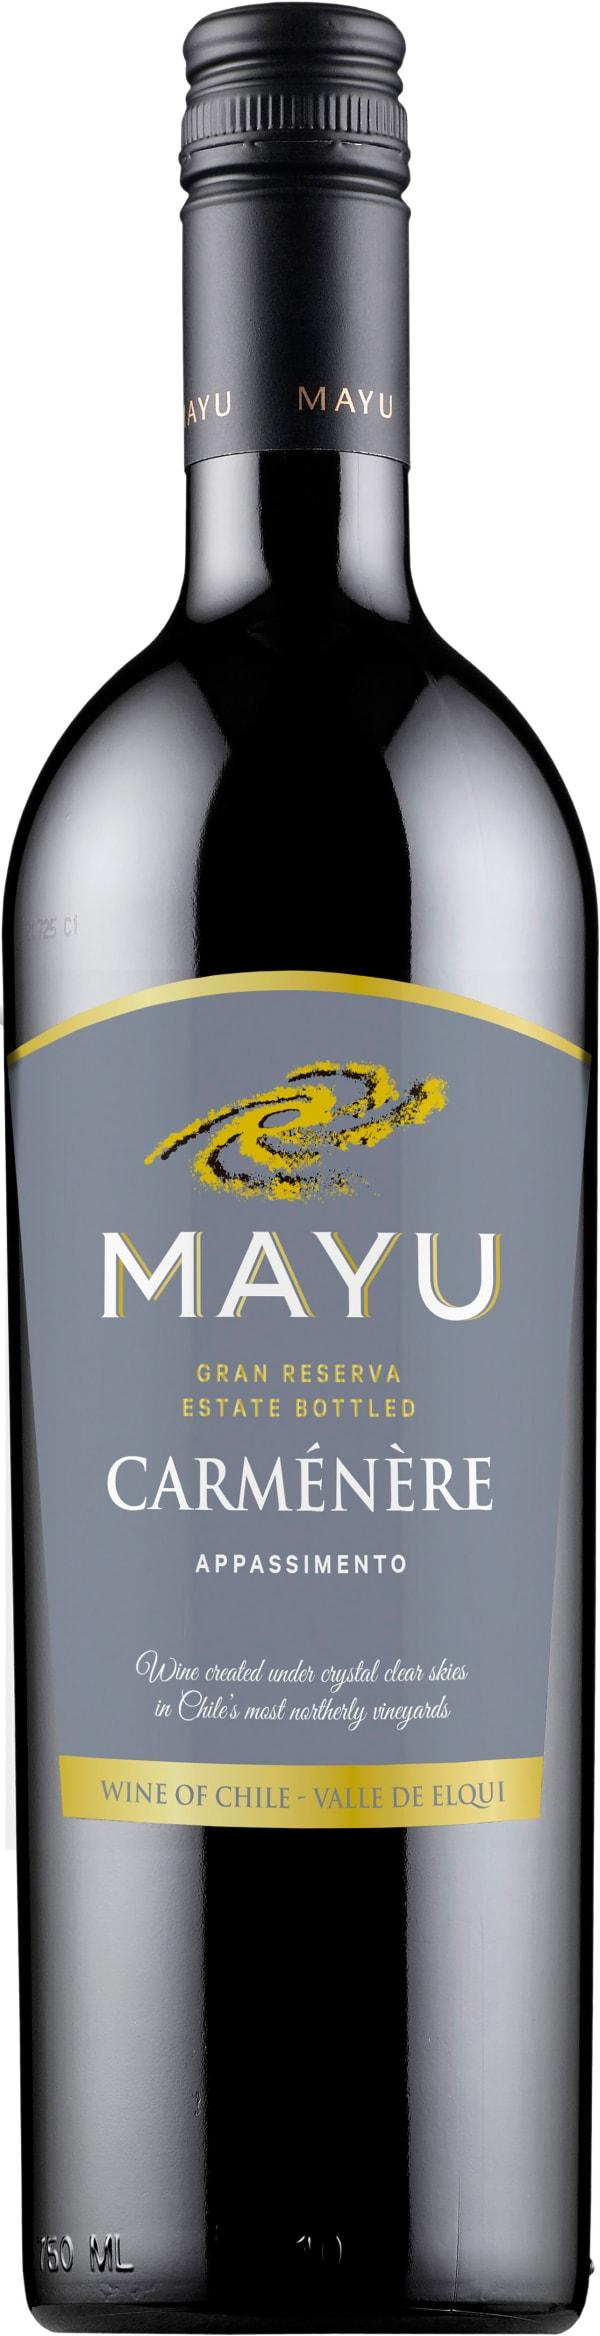 Mayu Gran Reserva Carmenere 2016 presentförpackning